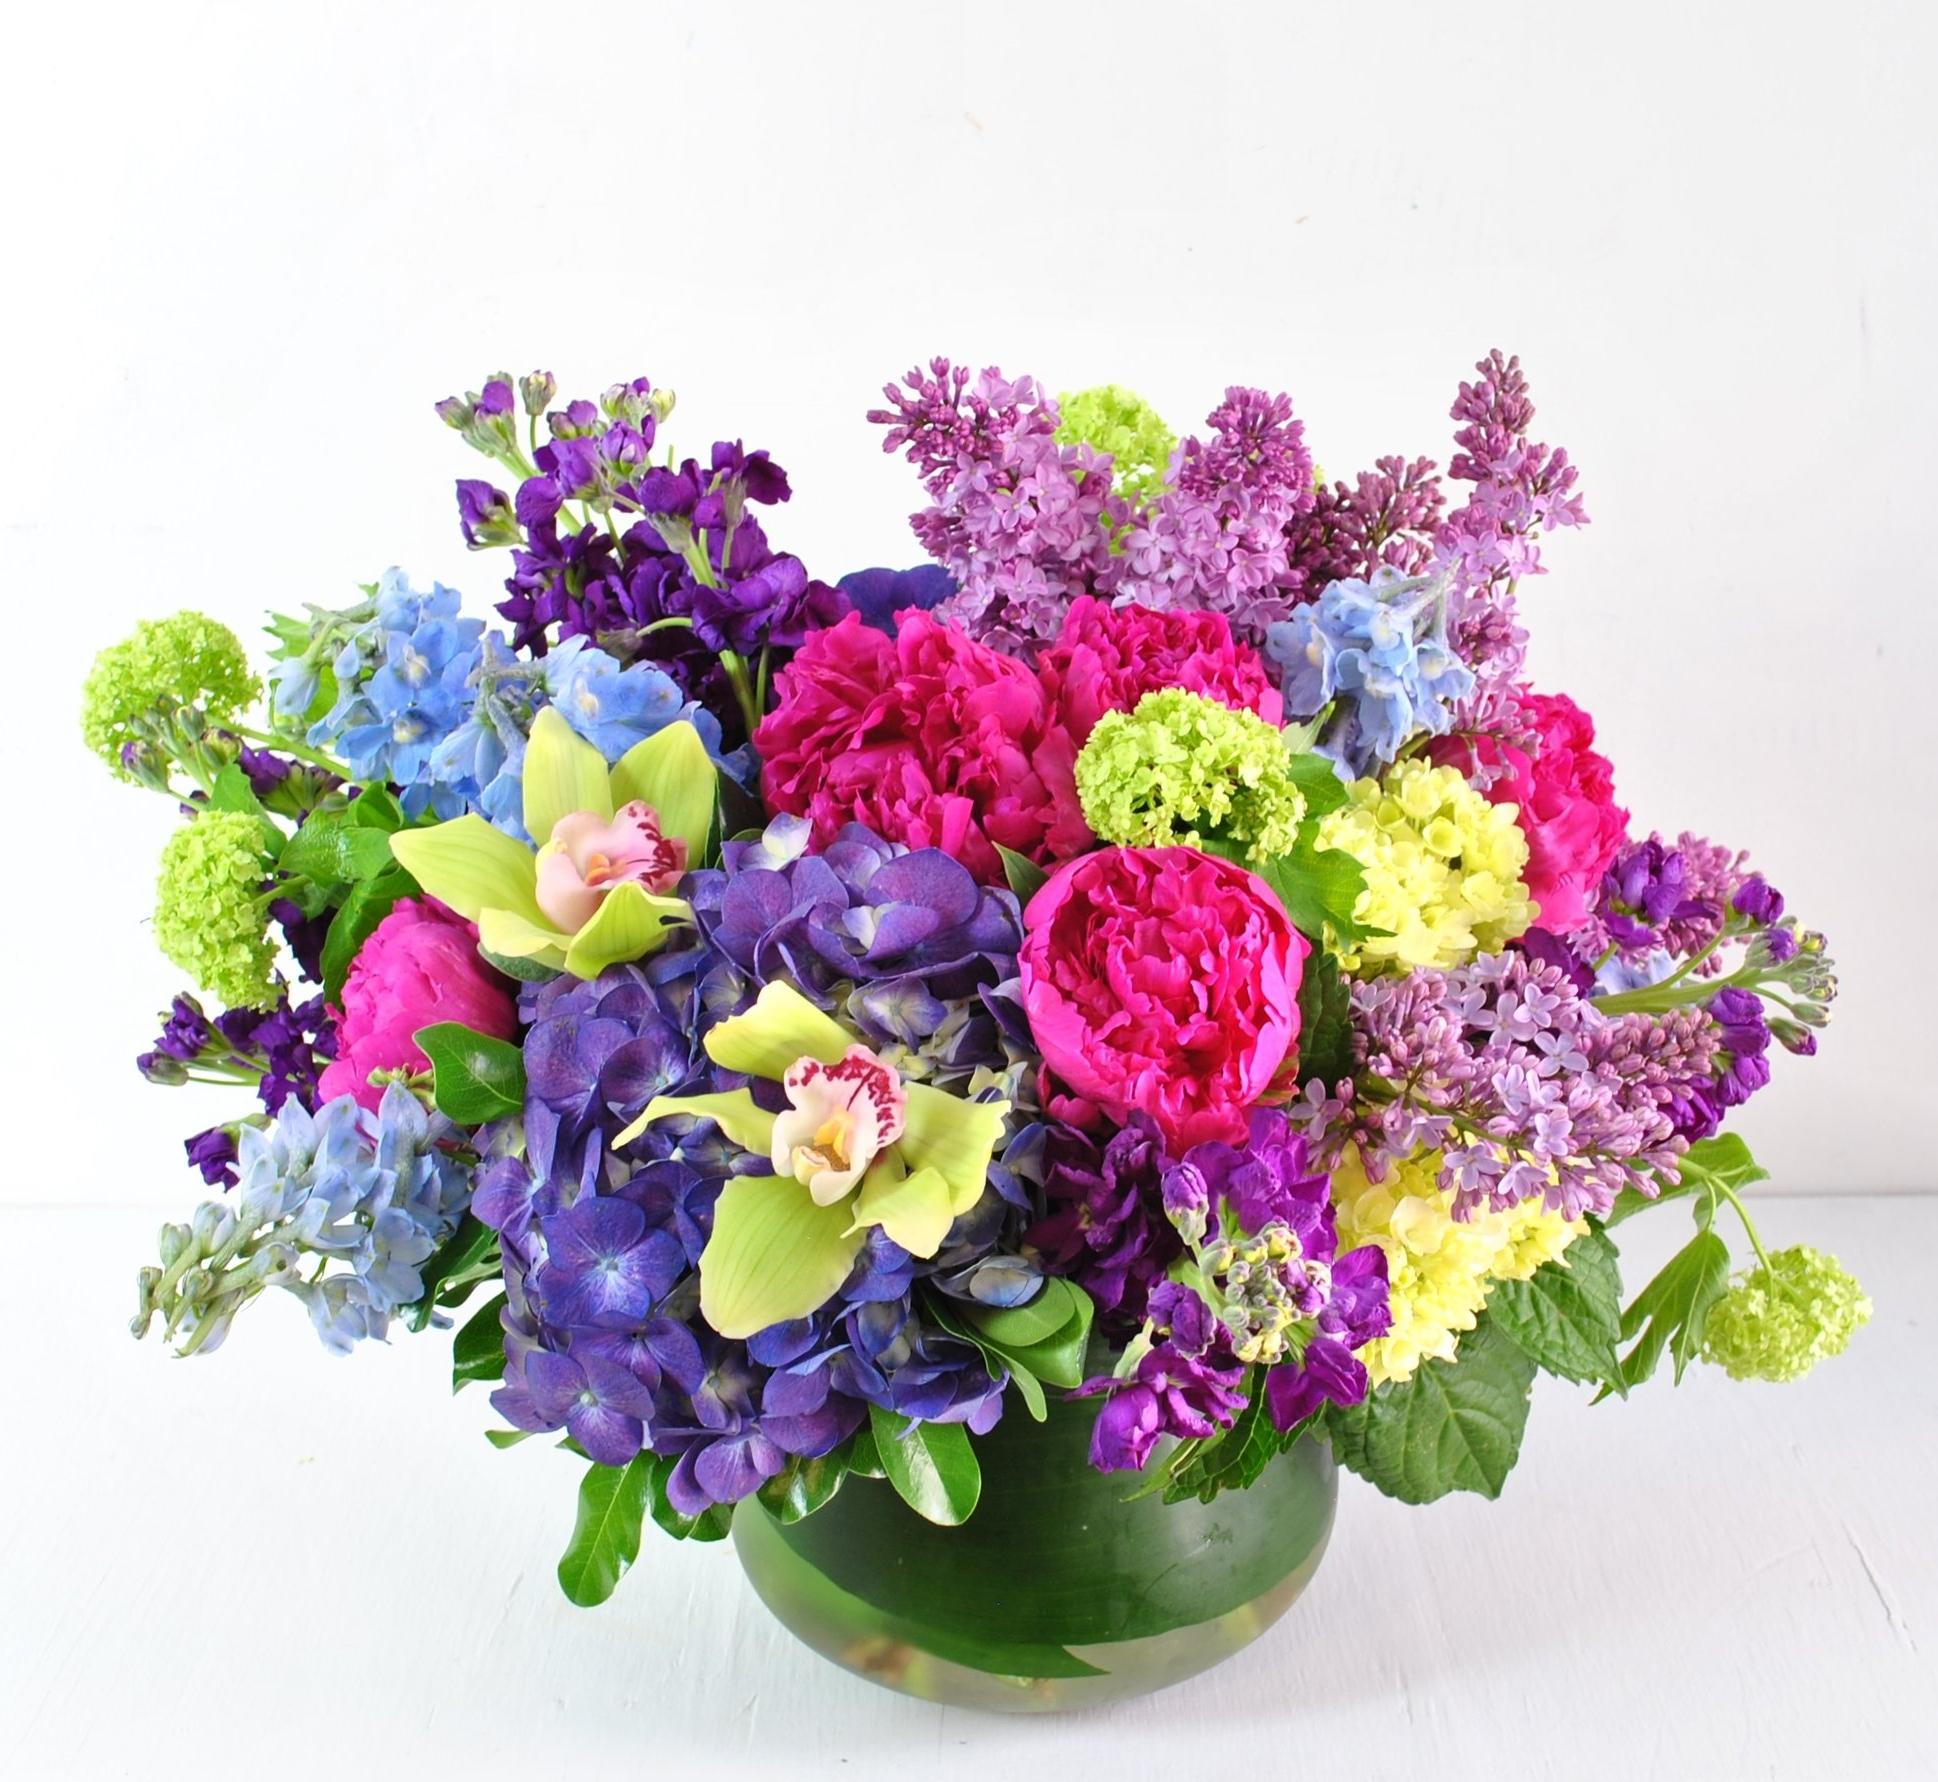 Copy of flowers downtown boston